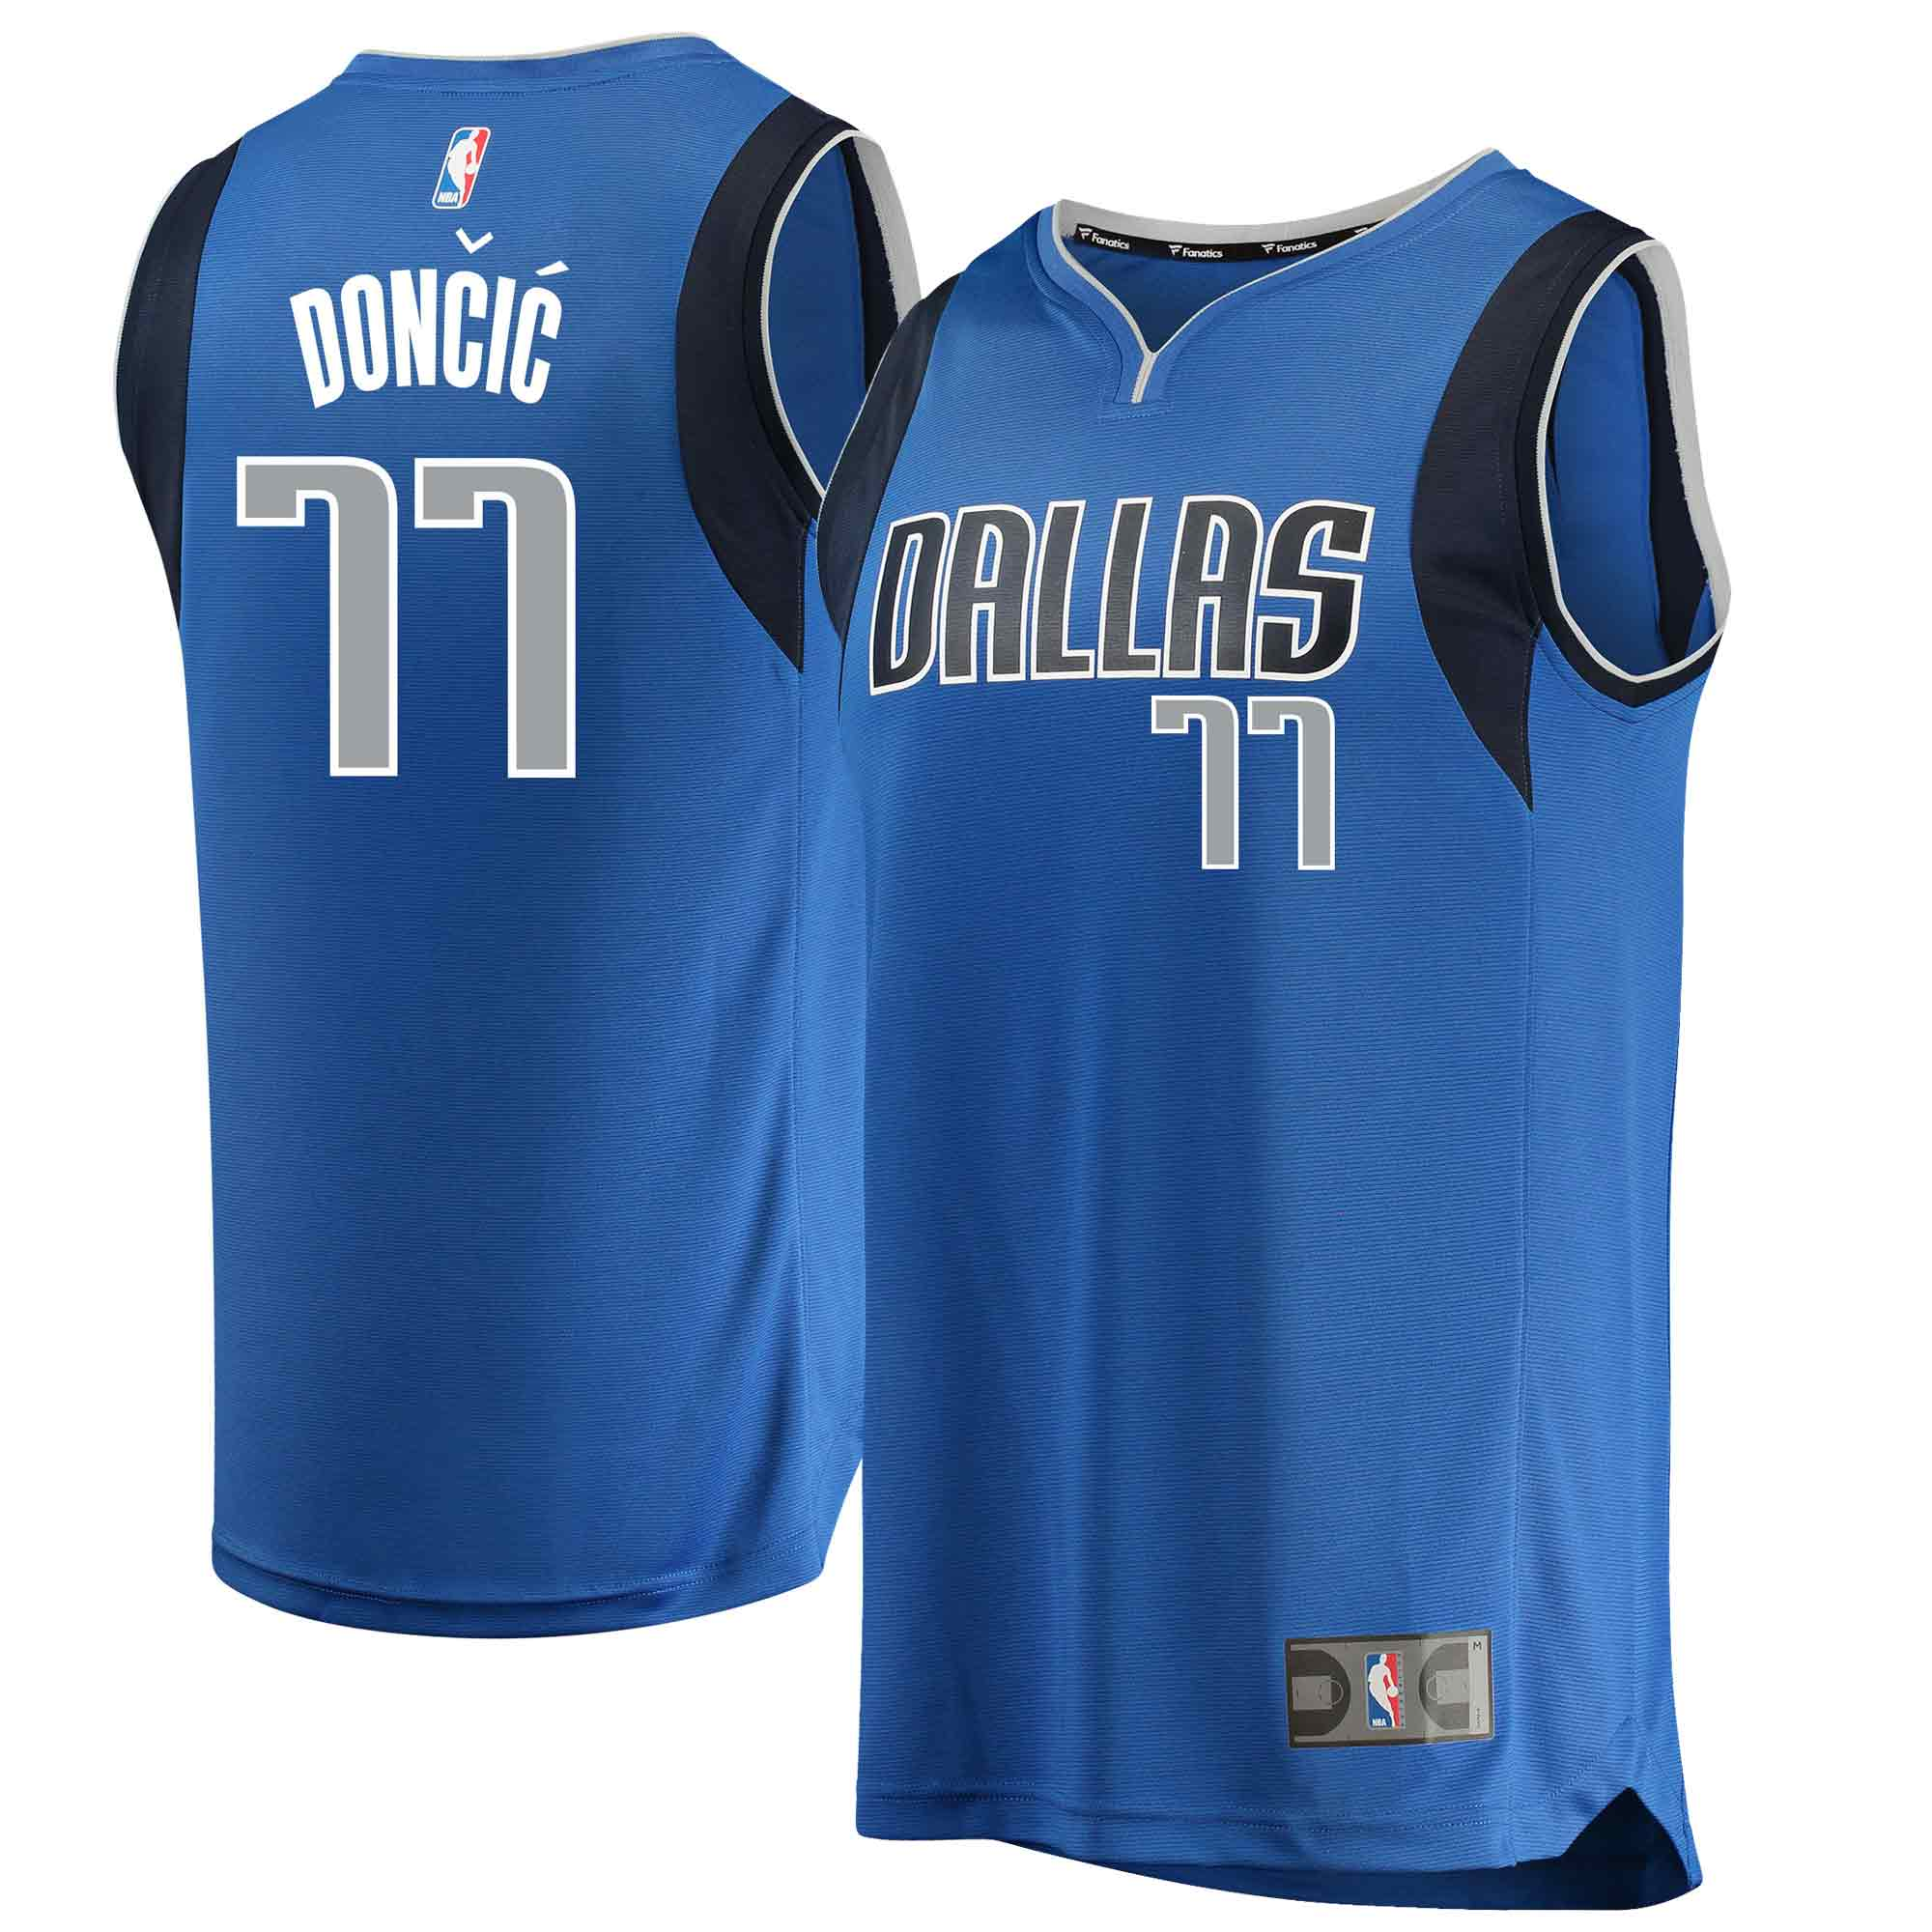 Luka Doncic Dallas Mavericks Fanatics Branded Youth 2018 NBA Draft First Round Pick Fast Break Replica Jersey Blue - Icon Edition